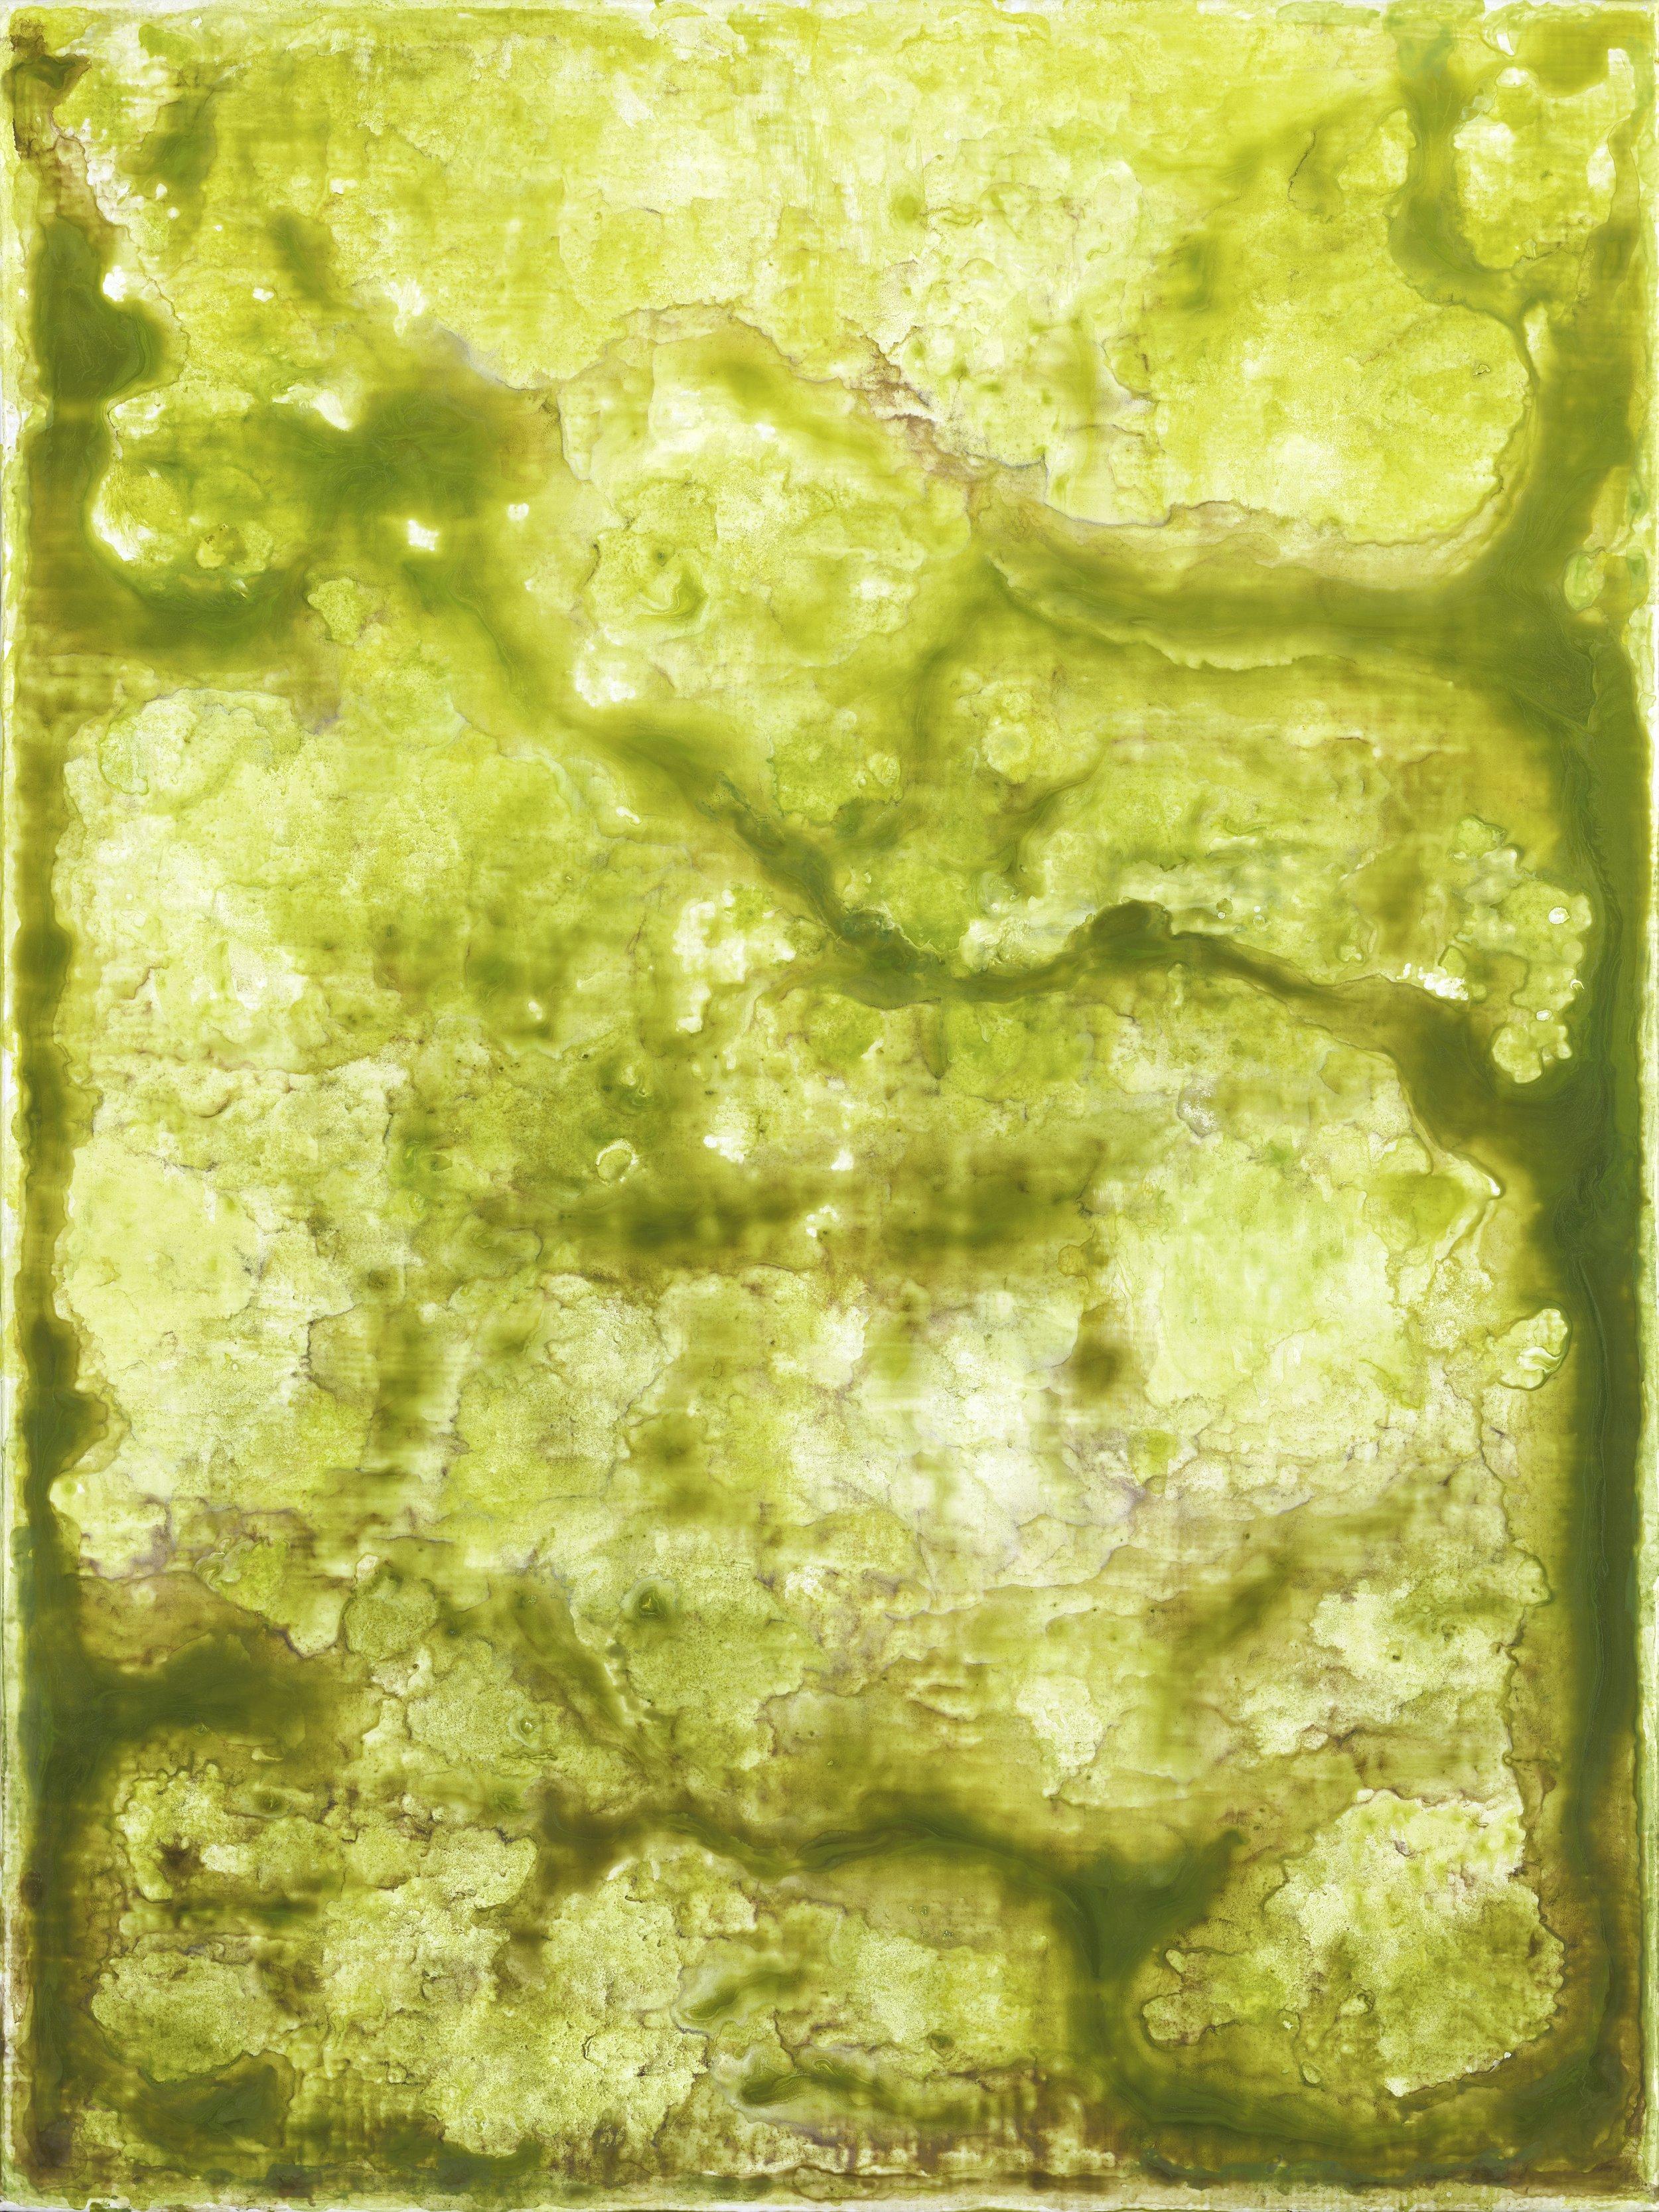 Karen Barth, White Light, 2014,Archival pigment on paper, mounted on panel, 40″ x 30″